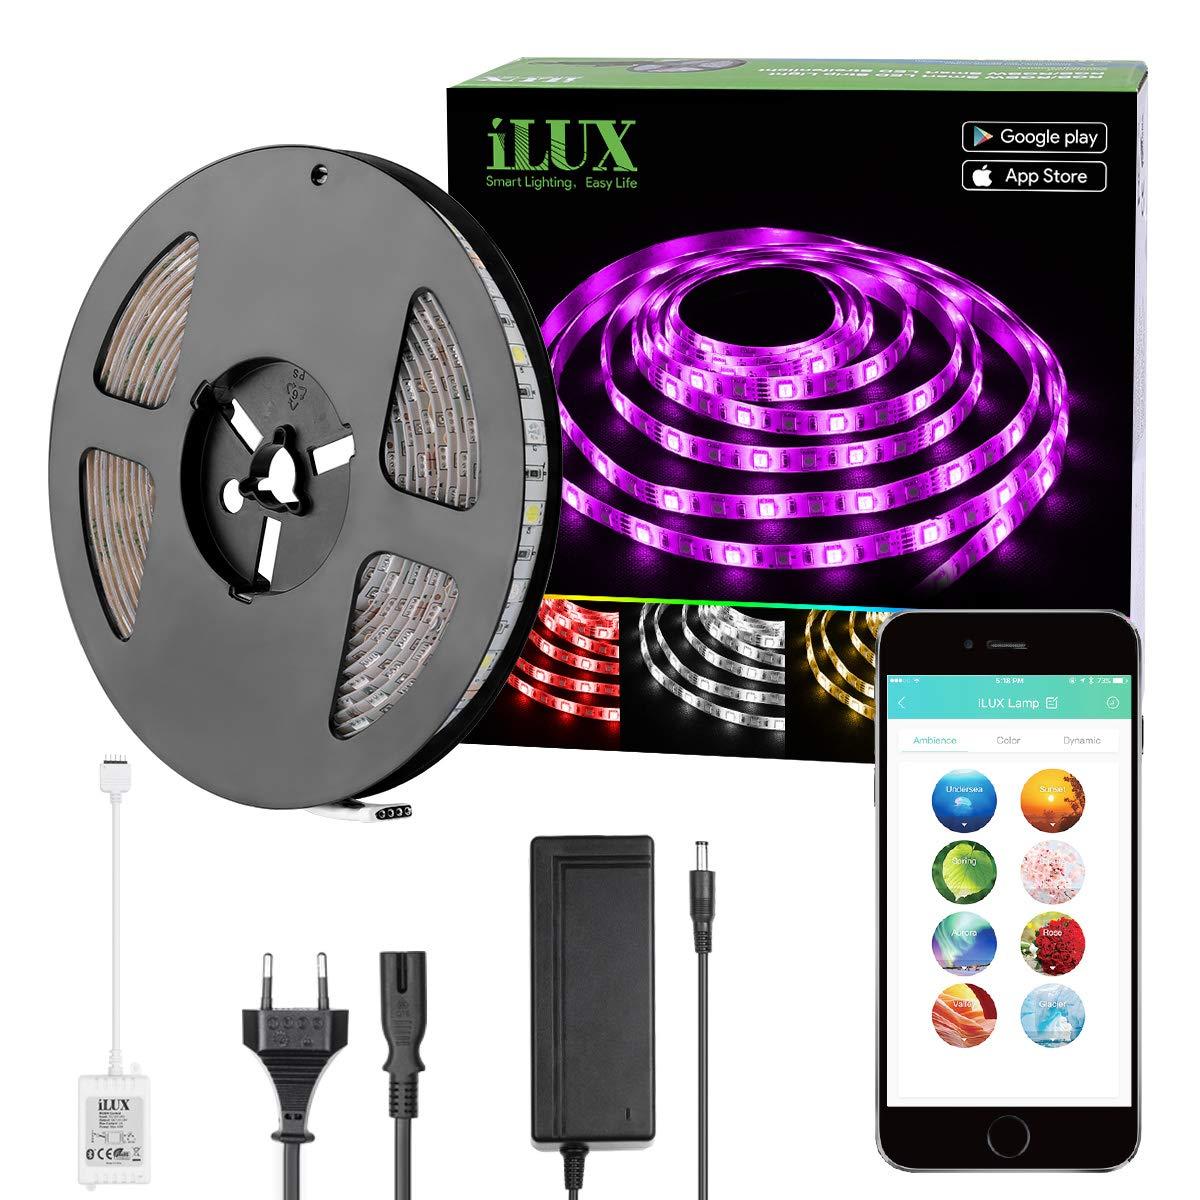 LE Intelligente LED Streifen Set Bluetooth RGBW, 5M 5050 300 LEDs Wasserfest LED Strip RGB+Kaltweiß, Smartphone kontrolliert Lichtband Lichterkette, inklusive 12V 3A Adapter [Energieklasse A+] Lighting EVER 900022-RGBW-F-EU